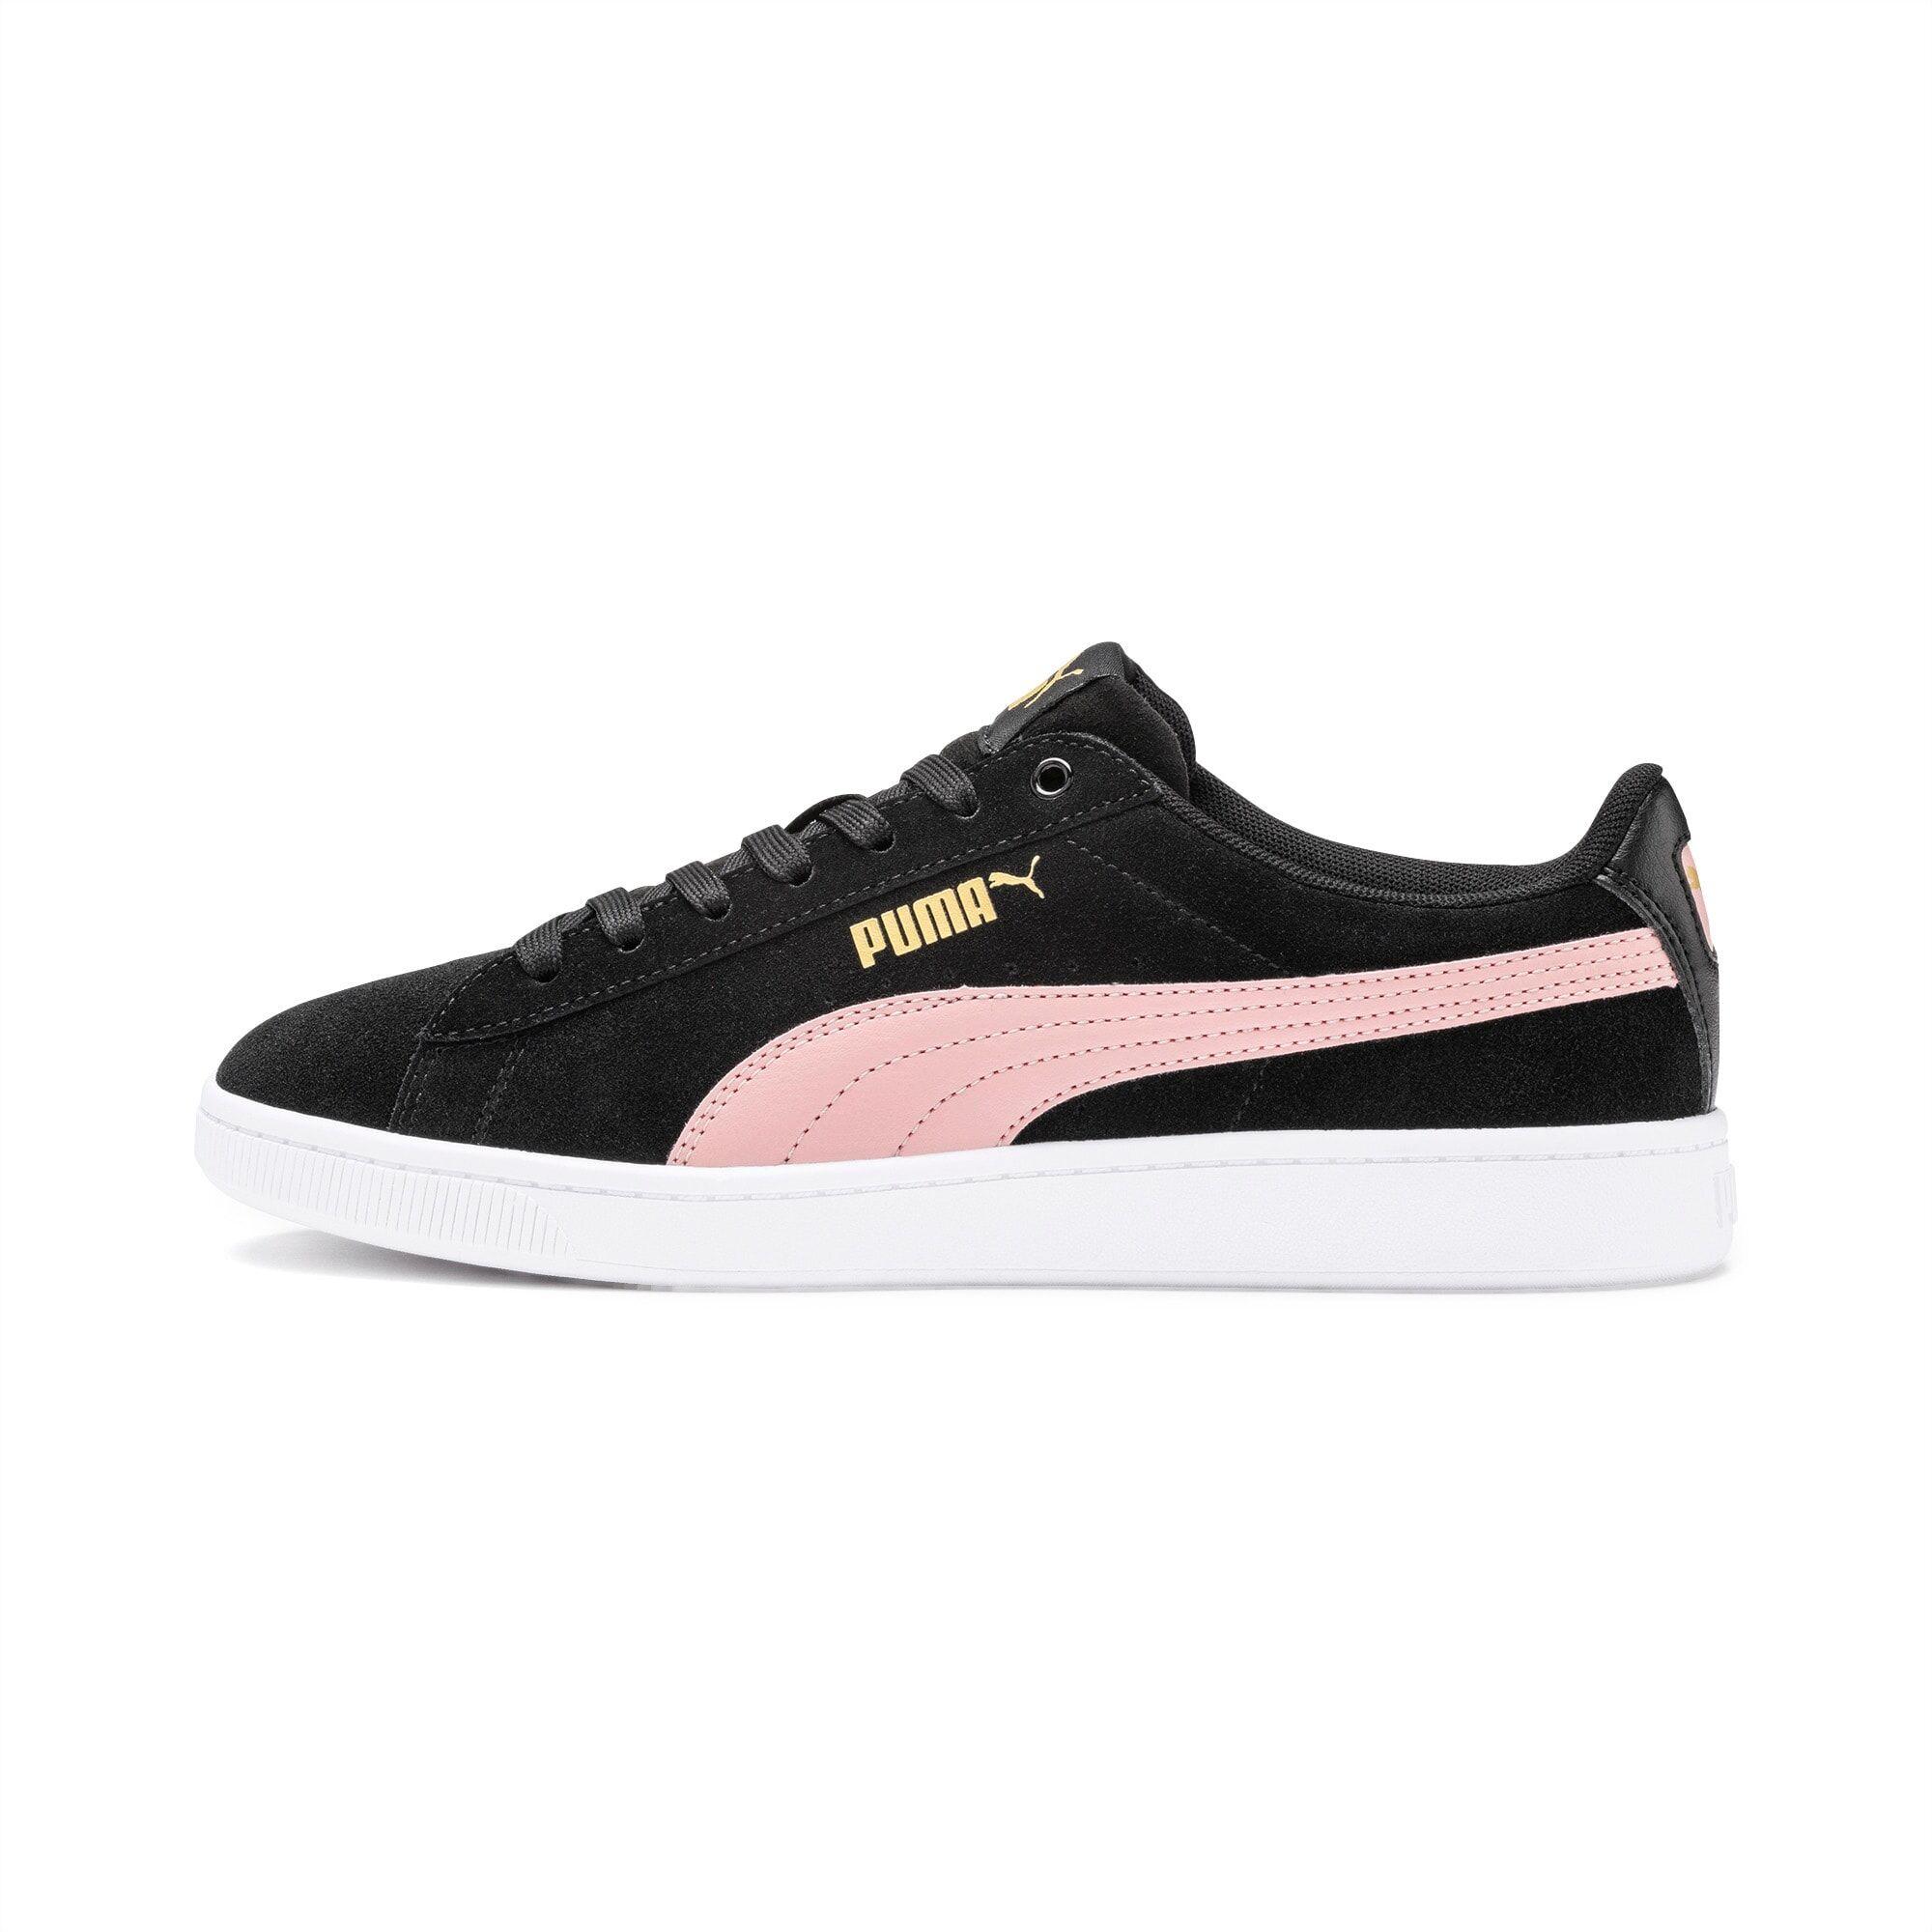 PUMA Chaussure Basket Vikky v2 pour Femme, Blanc/Rose/Noir, Taille 42, Chaussures